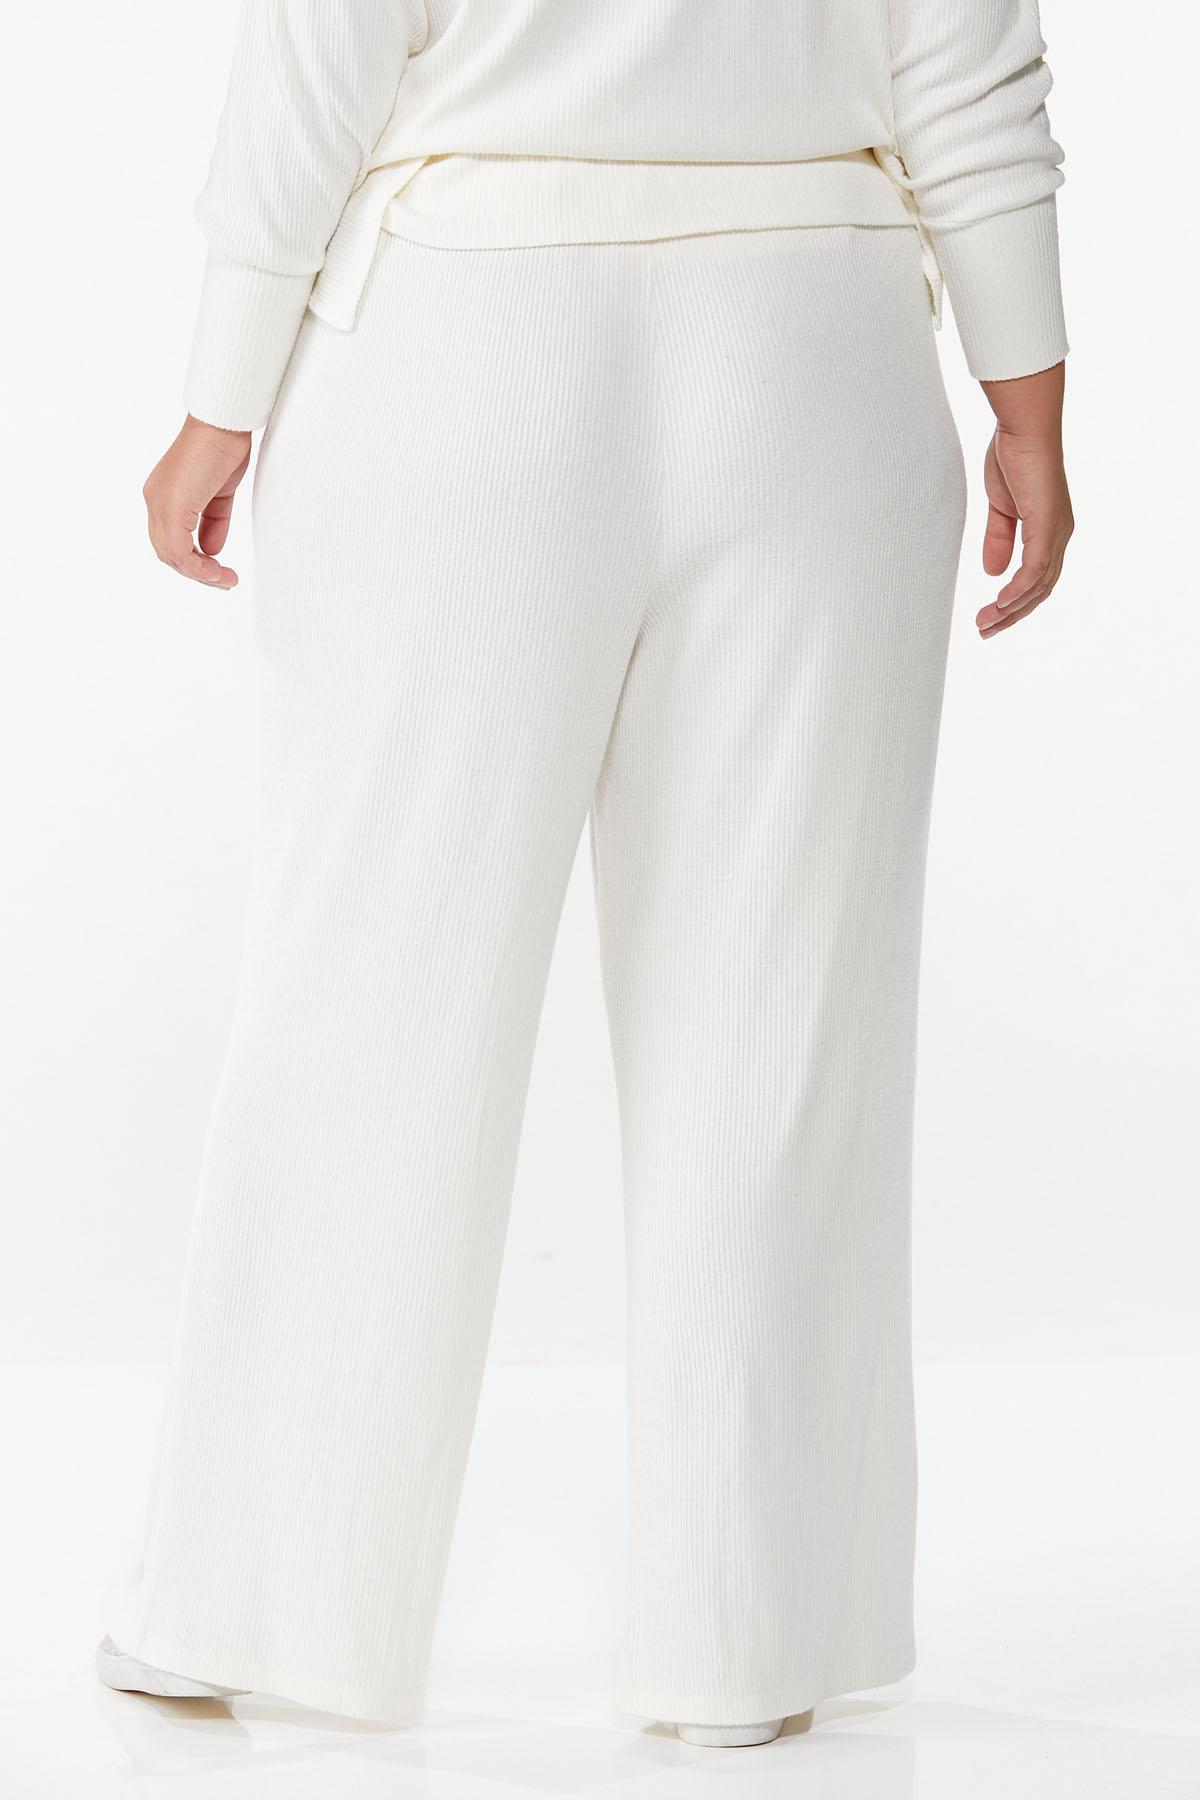 Plus Size Cozy Ribbed Lounge Pants (Item #44674715)